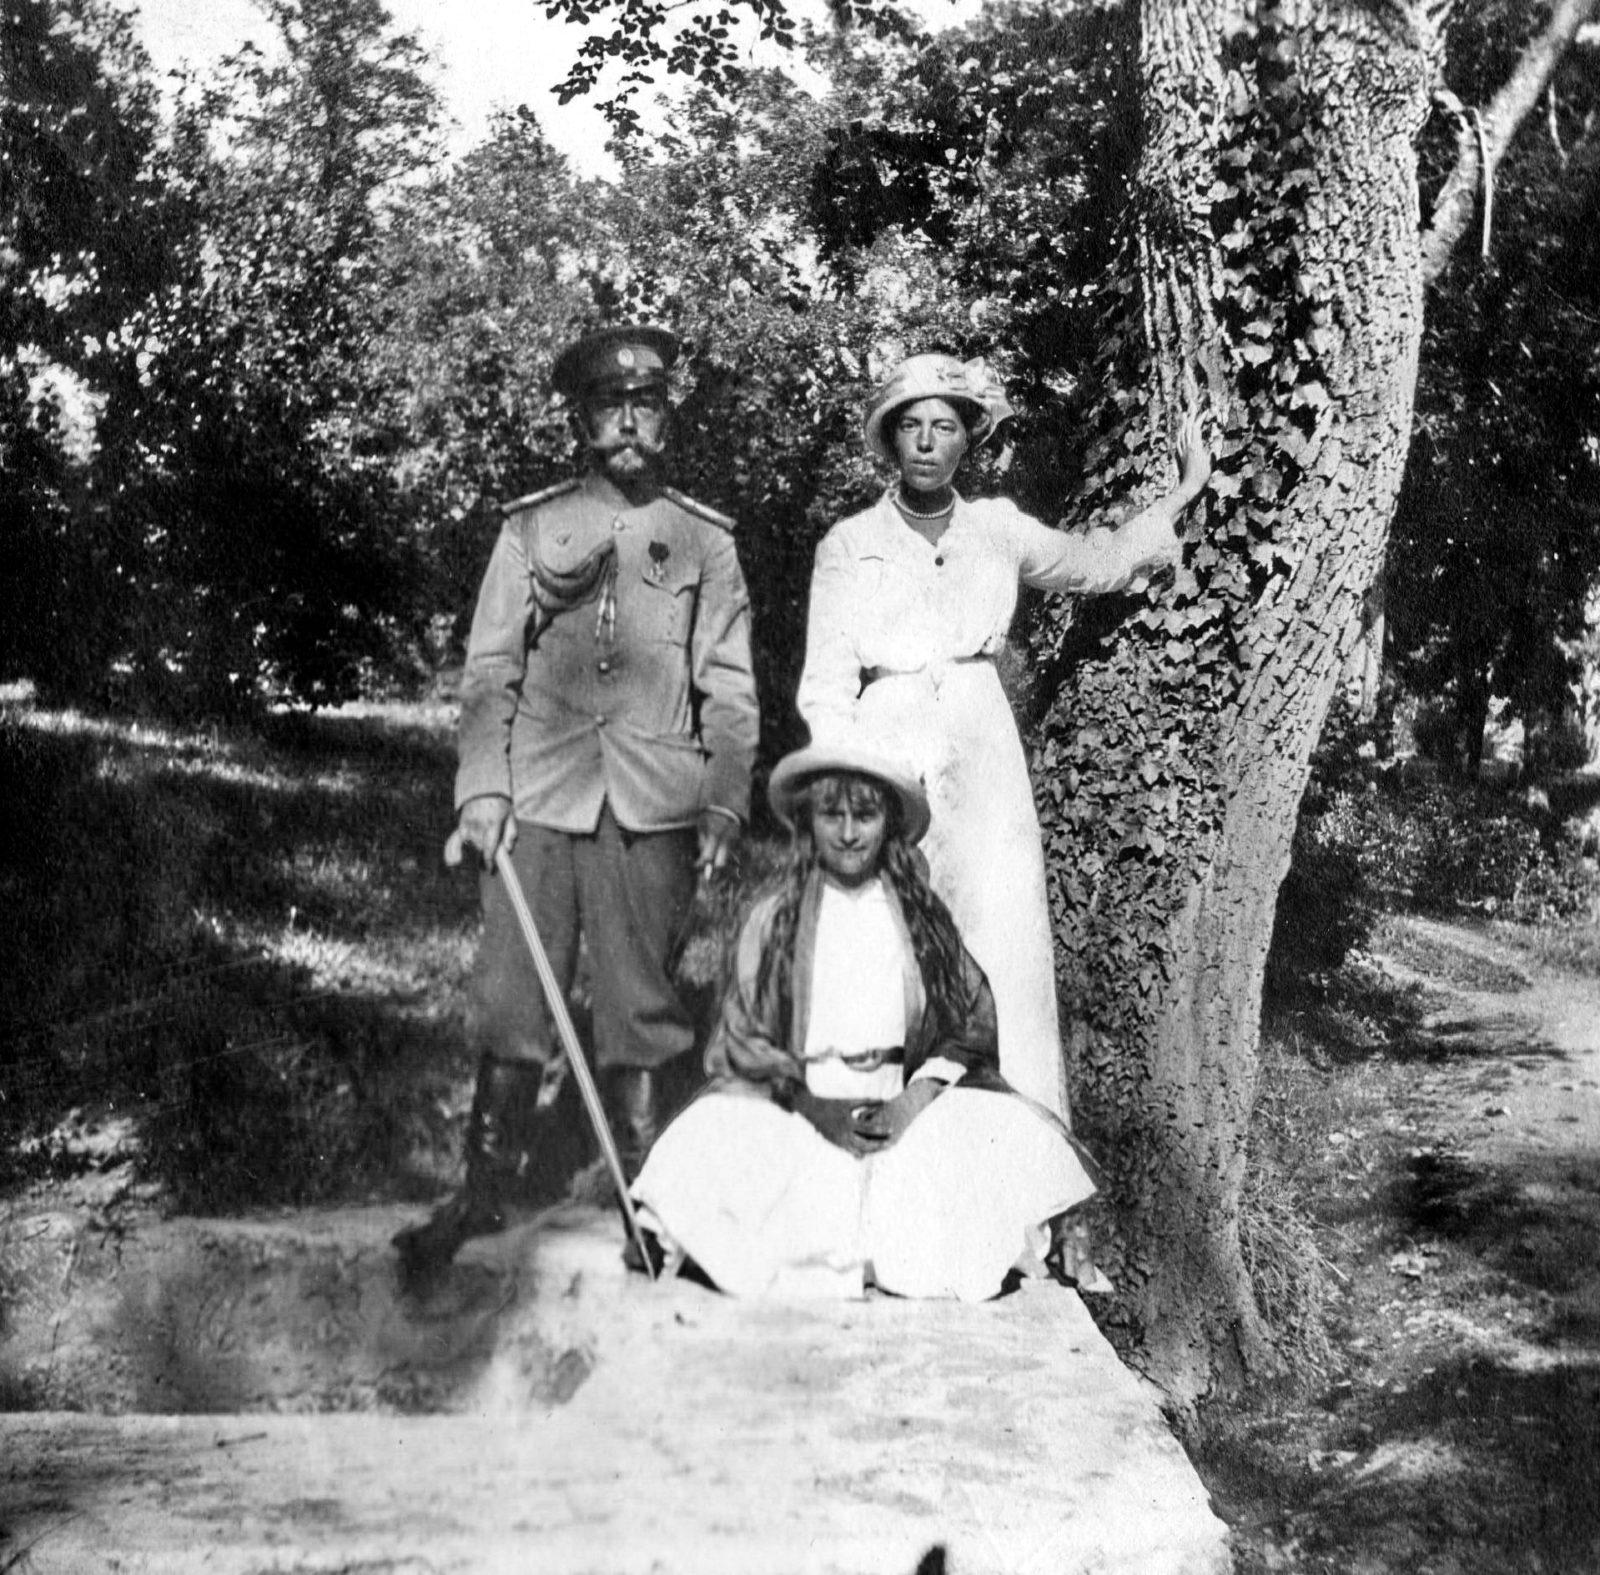 Emperor Nicholas II, Grand Duchess Olga Alexandrovna and Grand Duchess Anastasia Nikolaevna on a walk.